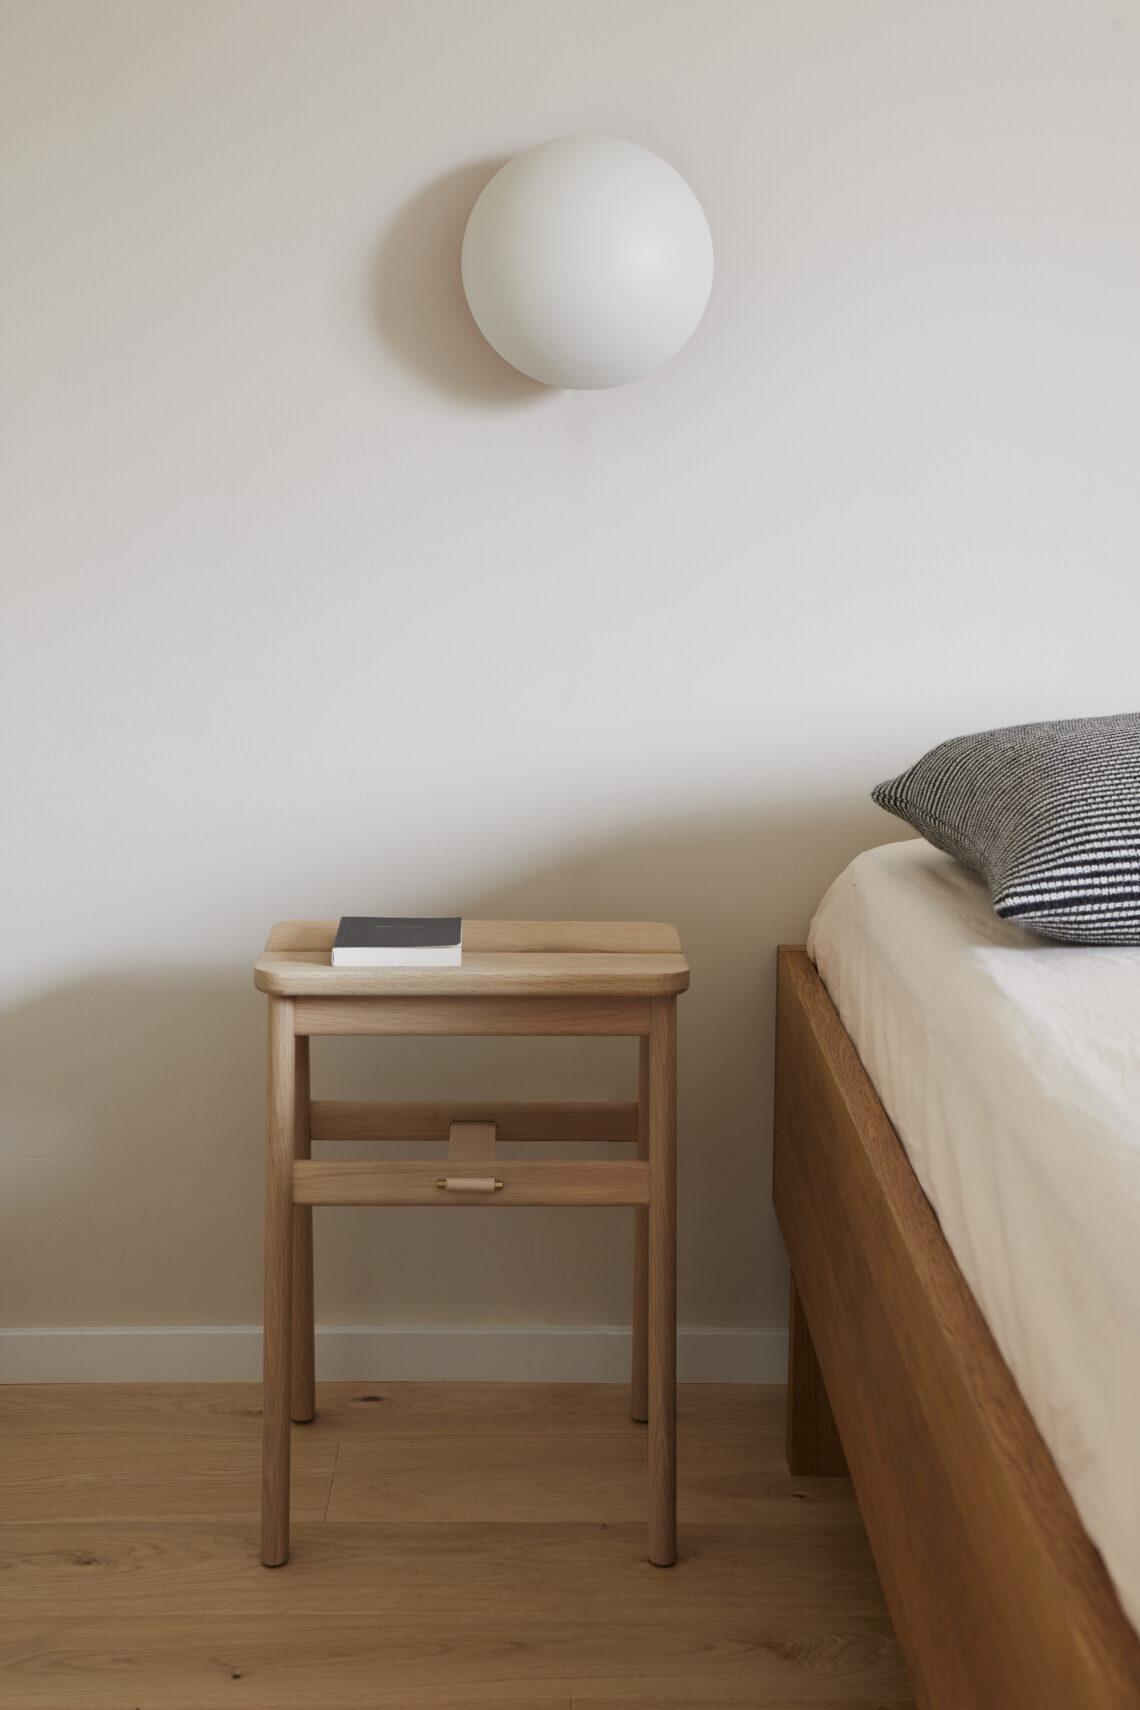 Form and refine Angle stool kruk eiken oak als nachttafel